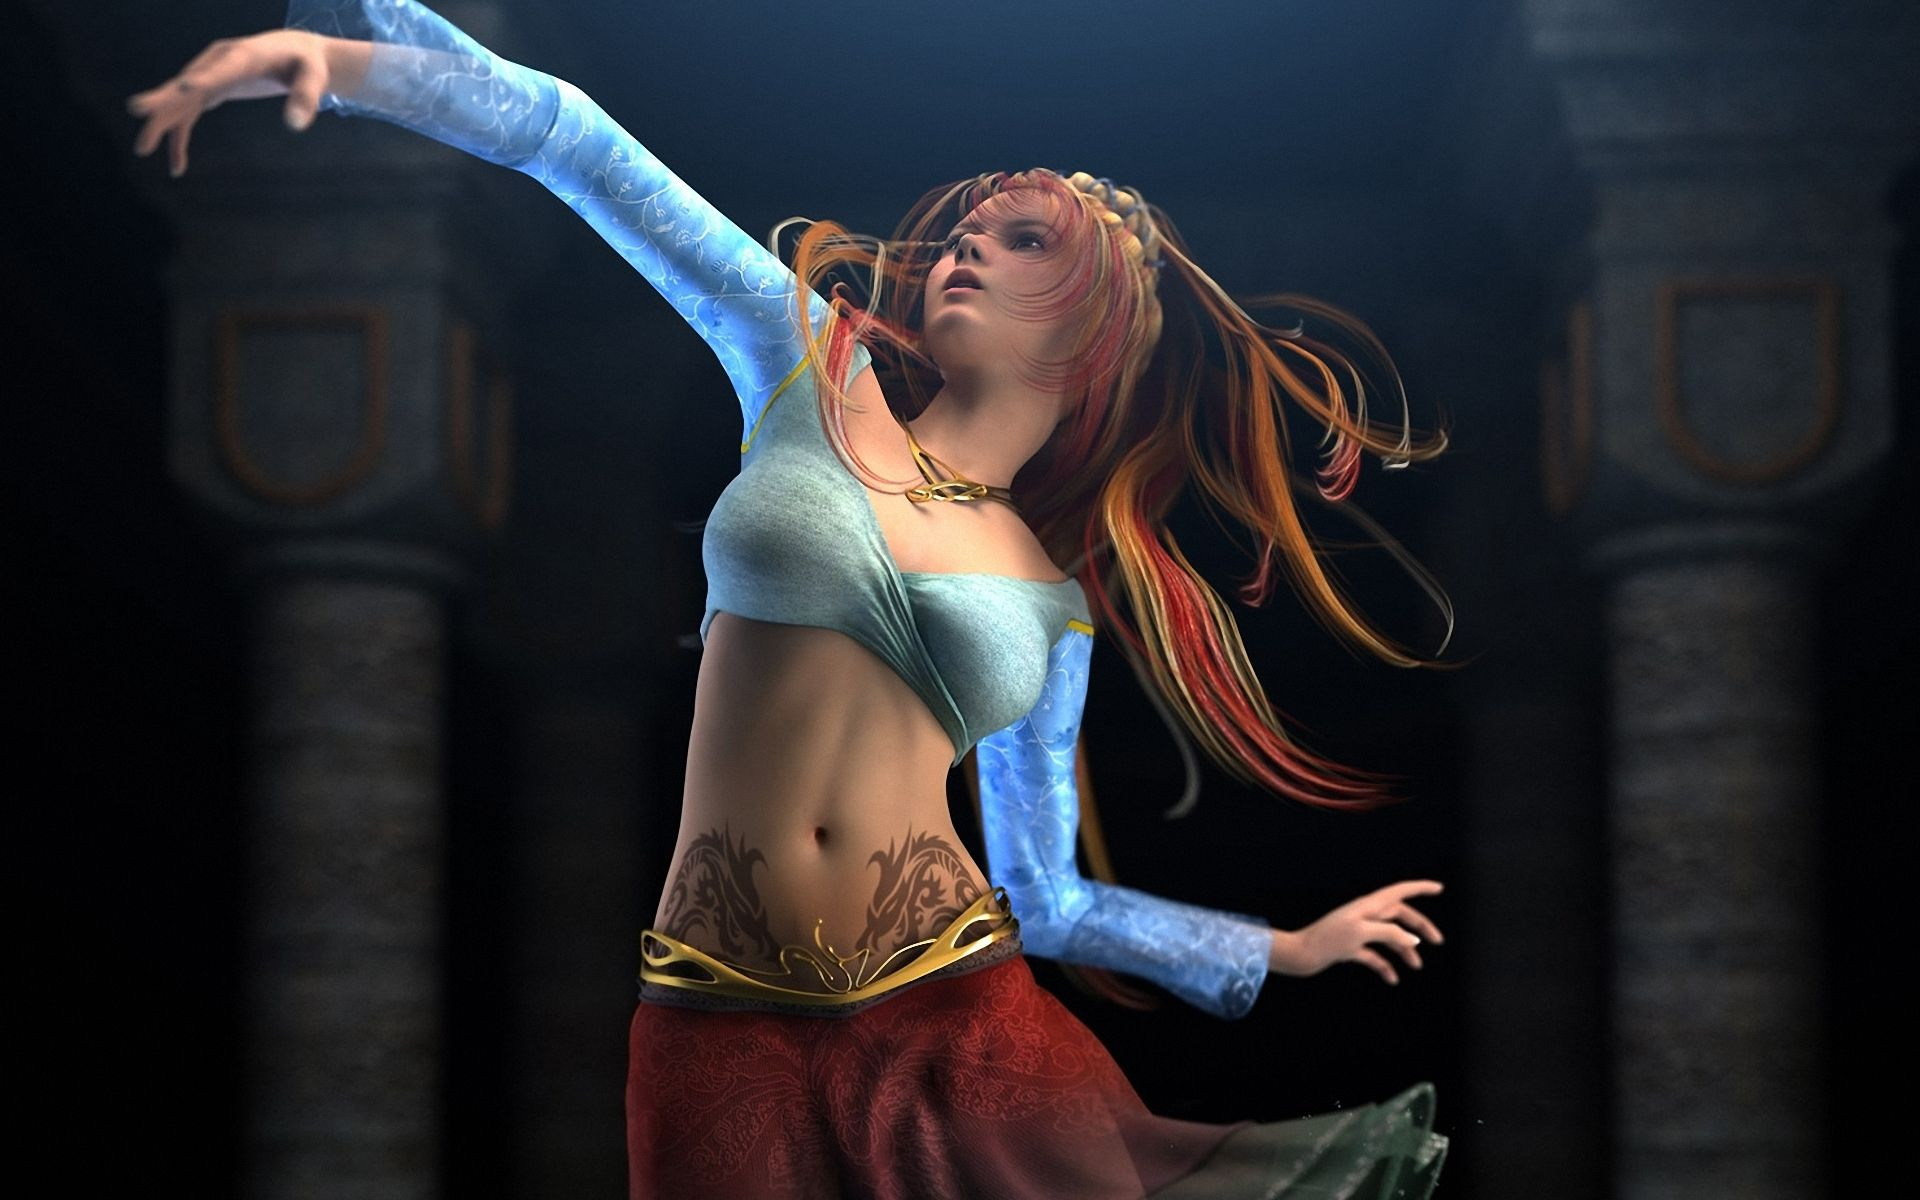 Girl 3d Hd Wallpapers And Widescreen For Windows 8 Girl Dancing Women Dance Wallpaper